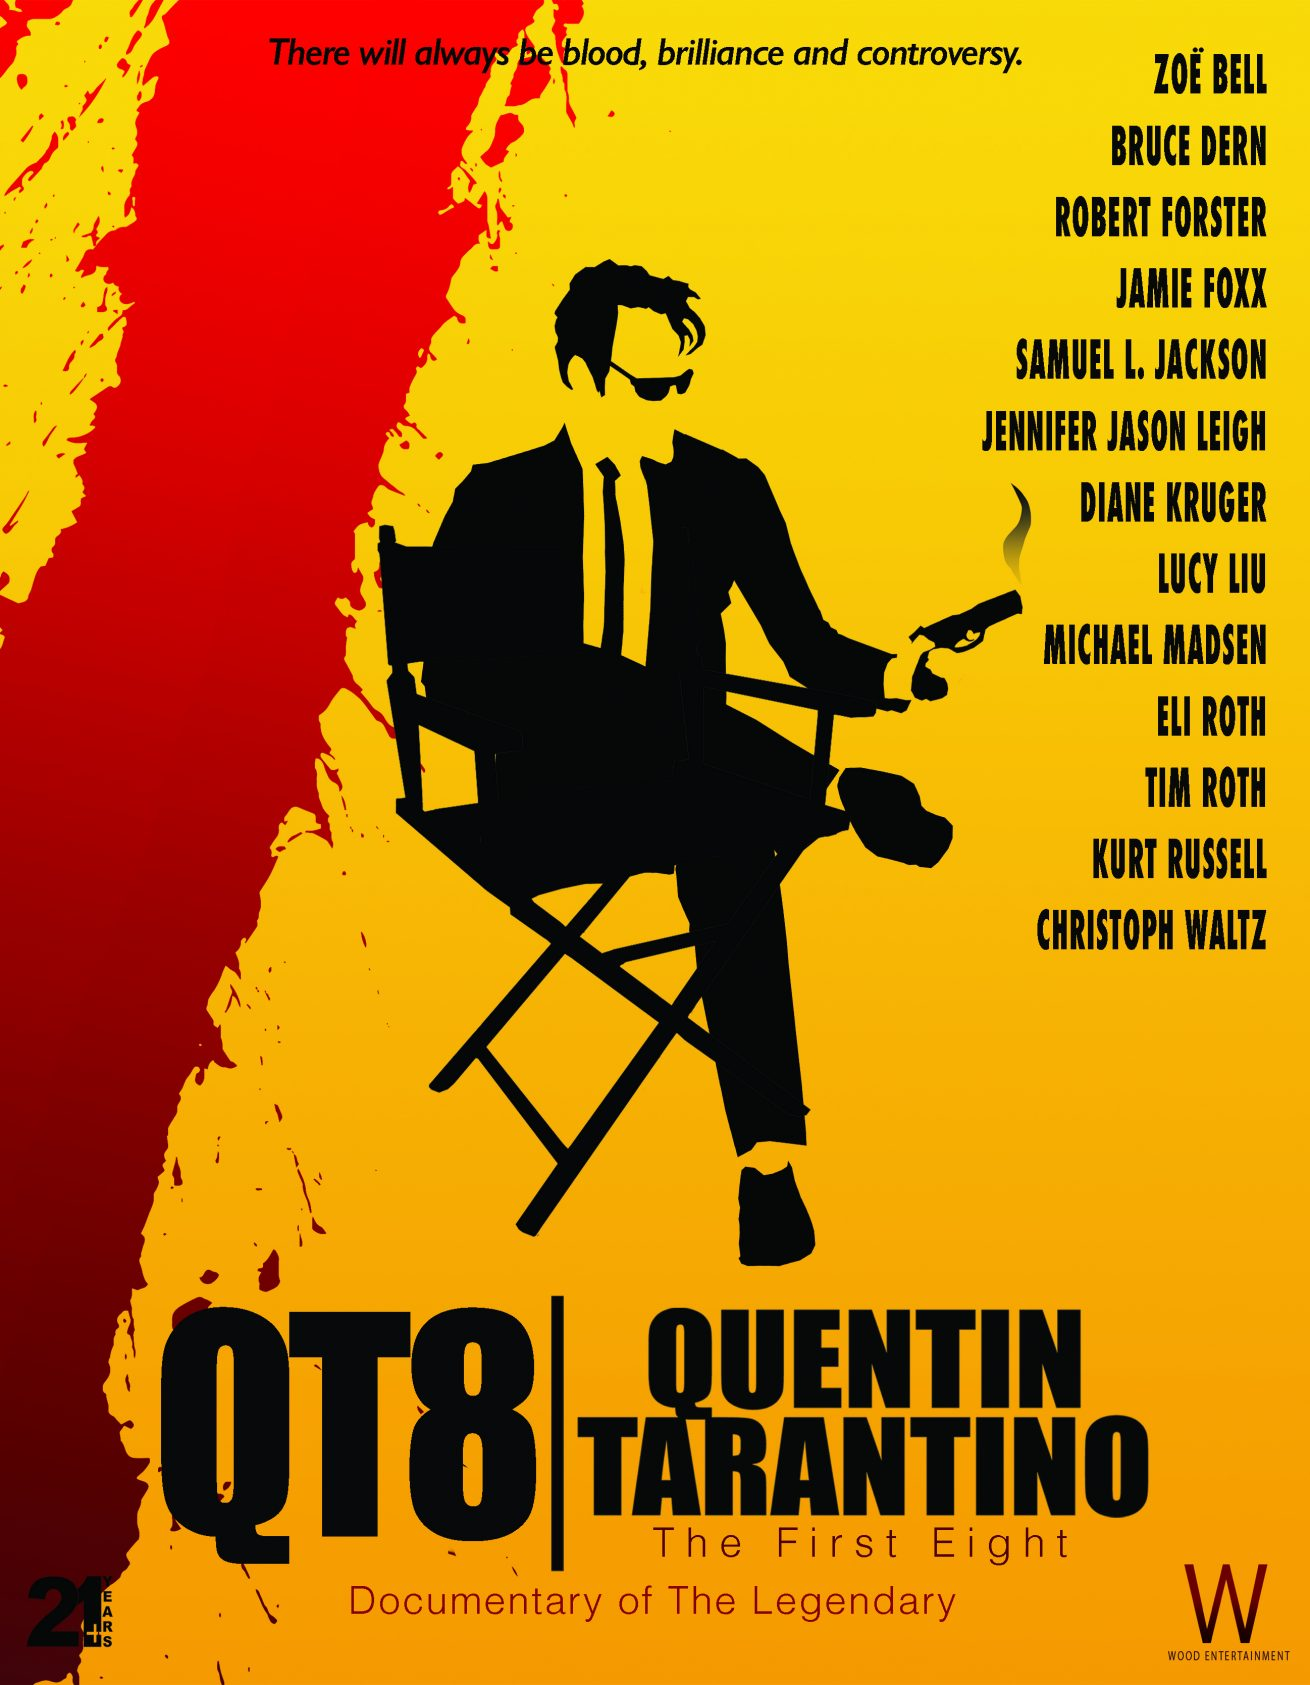 quentin tarantino'nun ilk sekiz filmini anlatacak the first eight'ten fragman